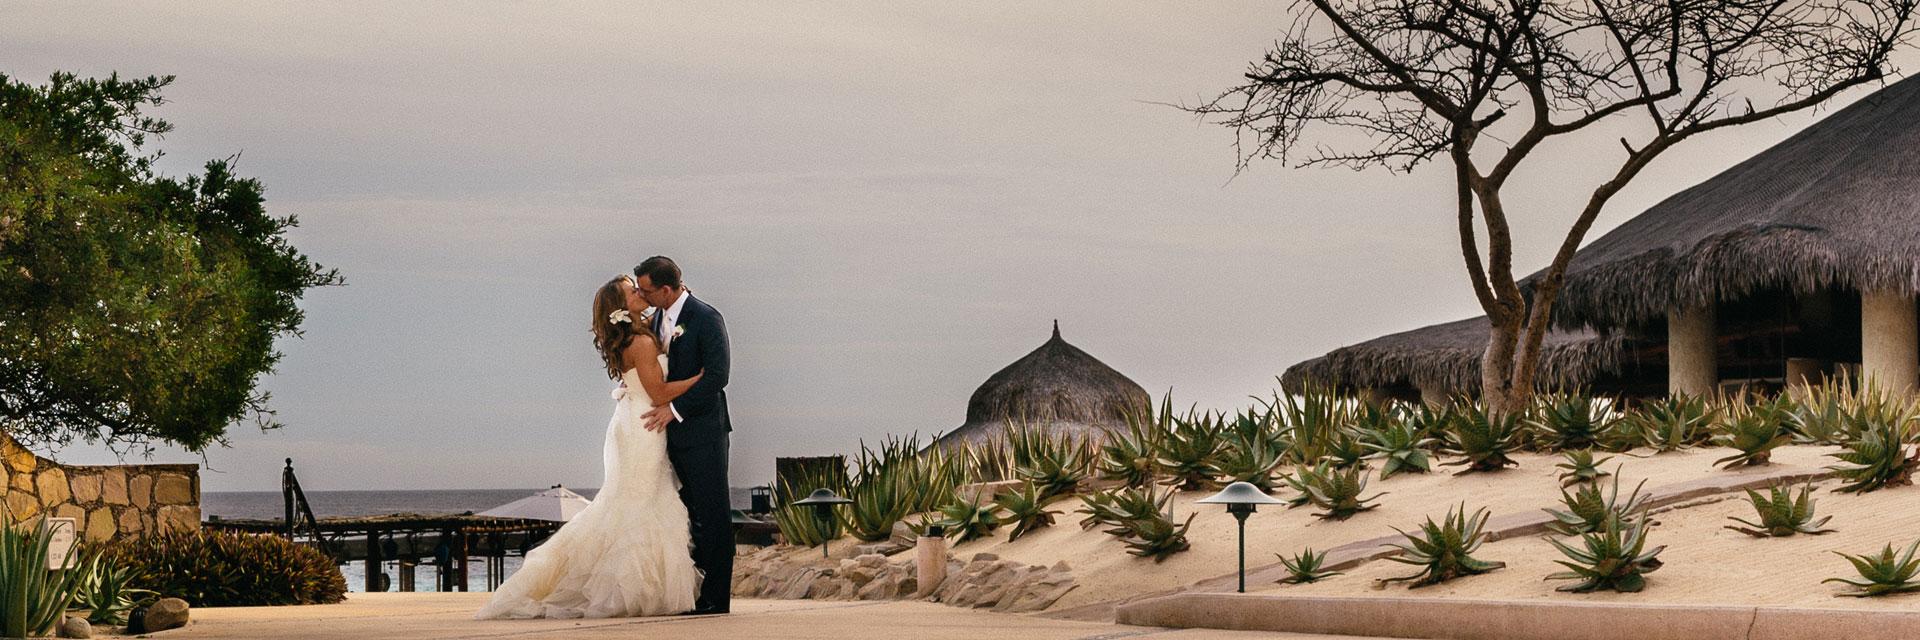 Wedding couple sharing a kiss on a beach path in Mexico